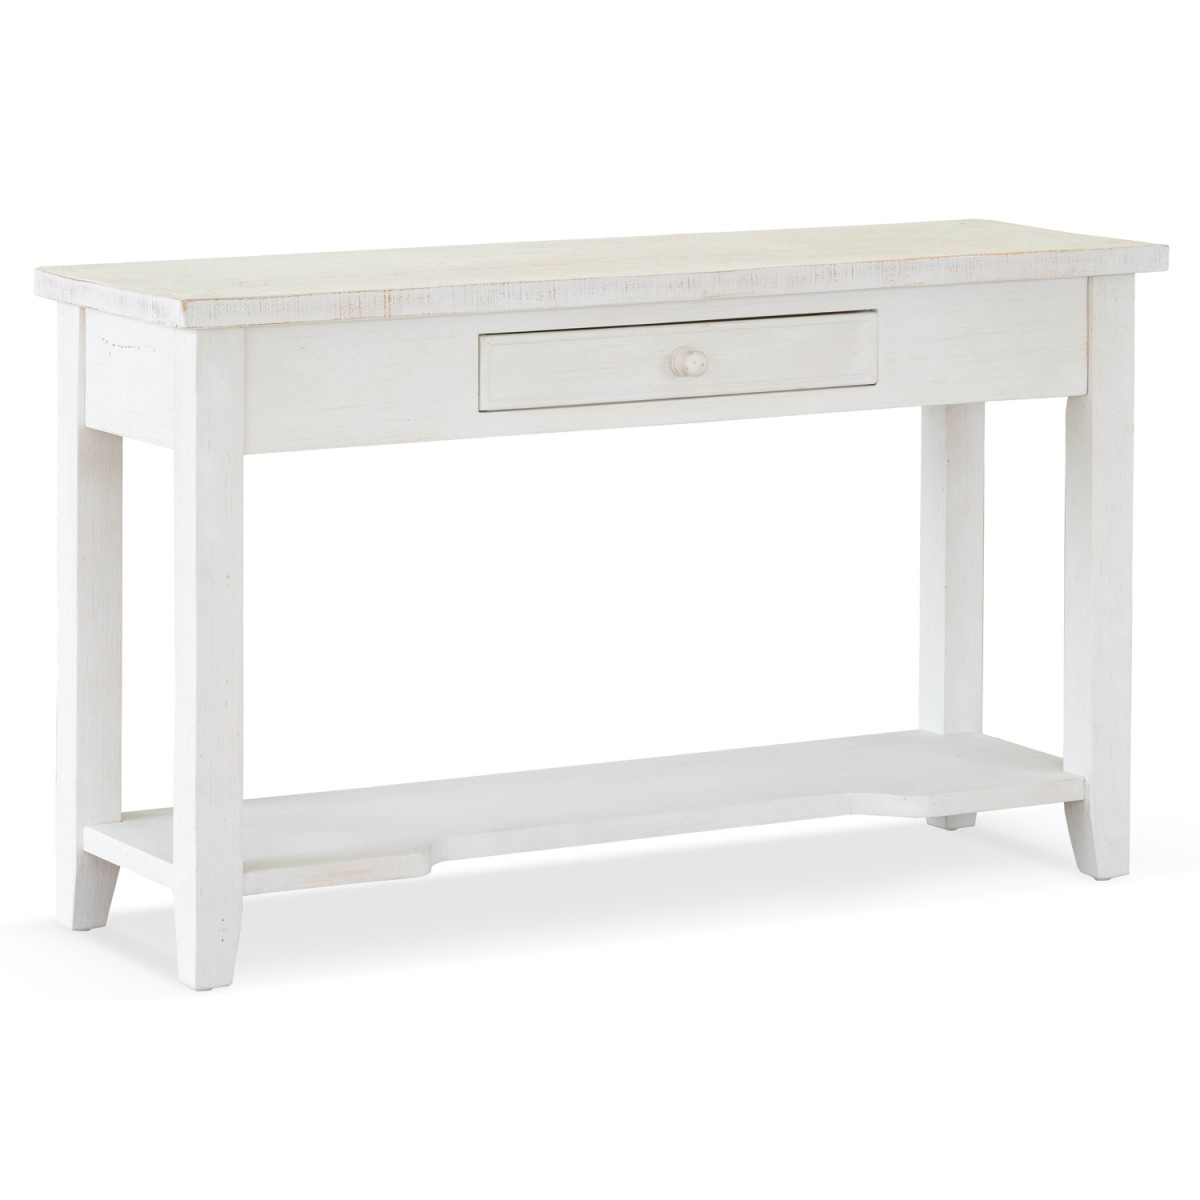 console 1 tiroir bois blanc 120x41 5x78cm